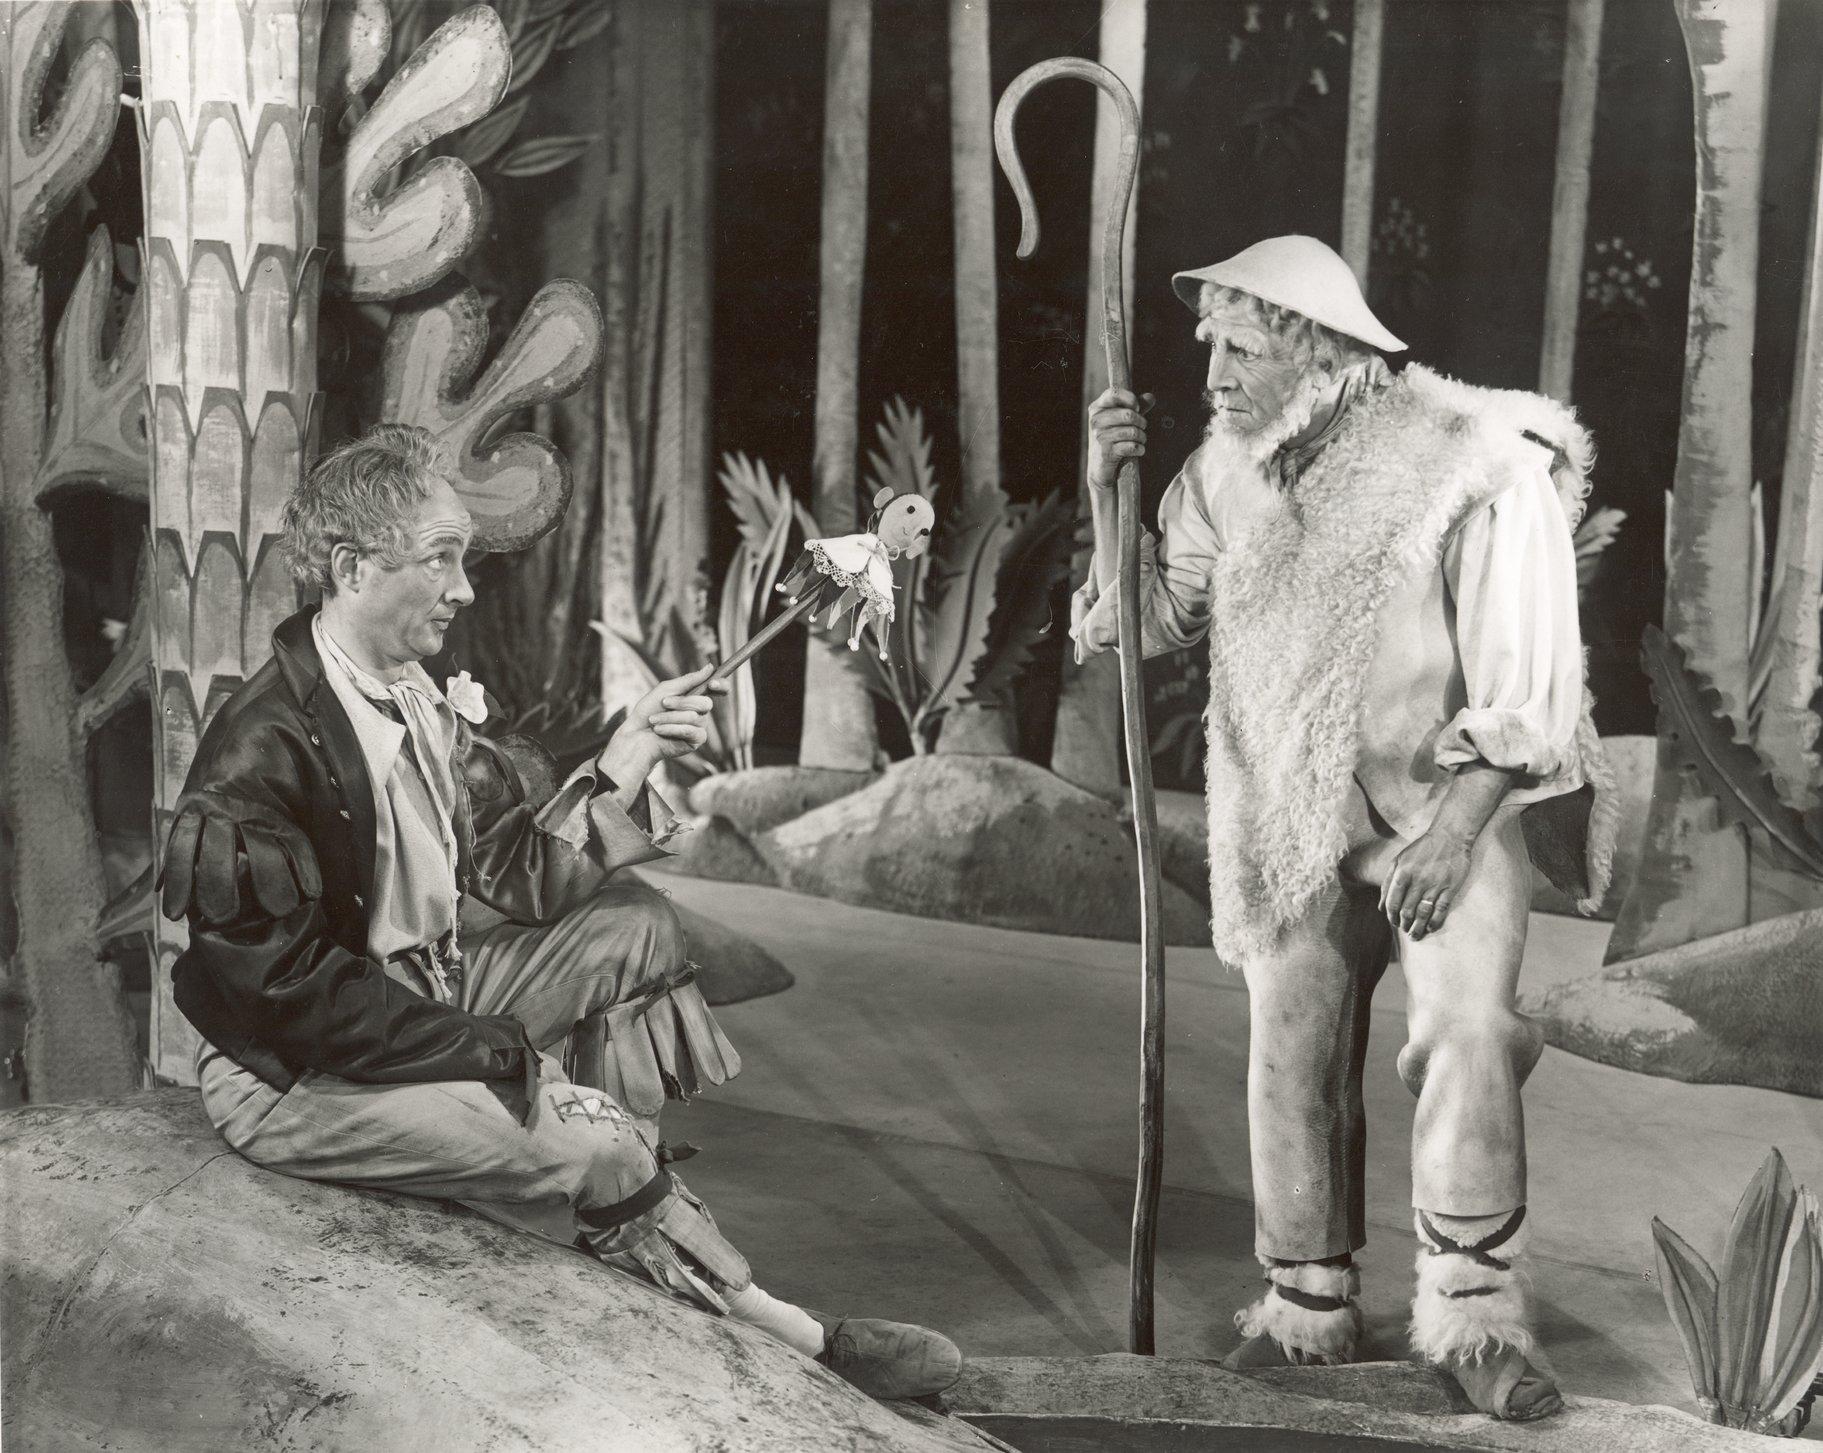 A man talks to an elderly shepherd.